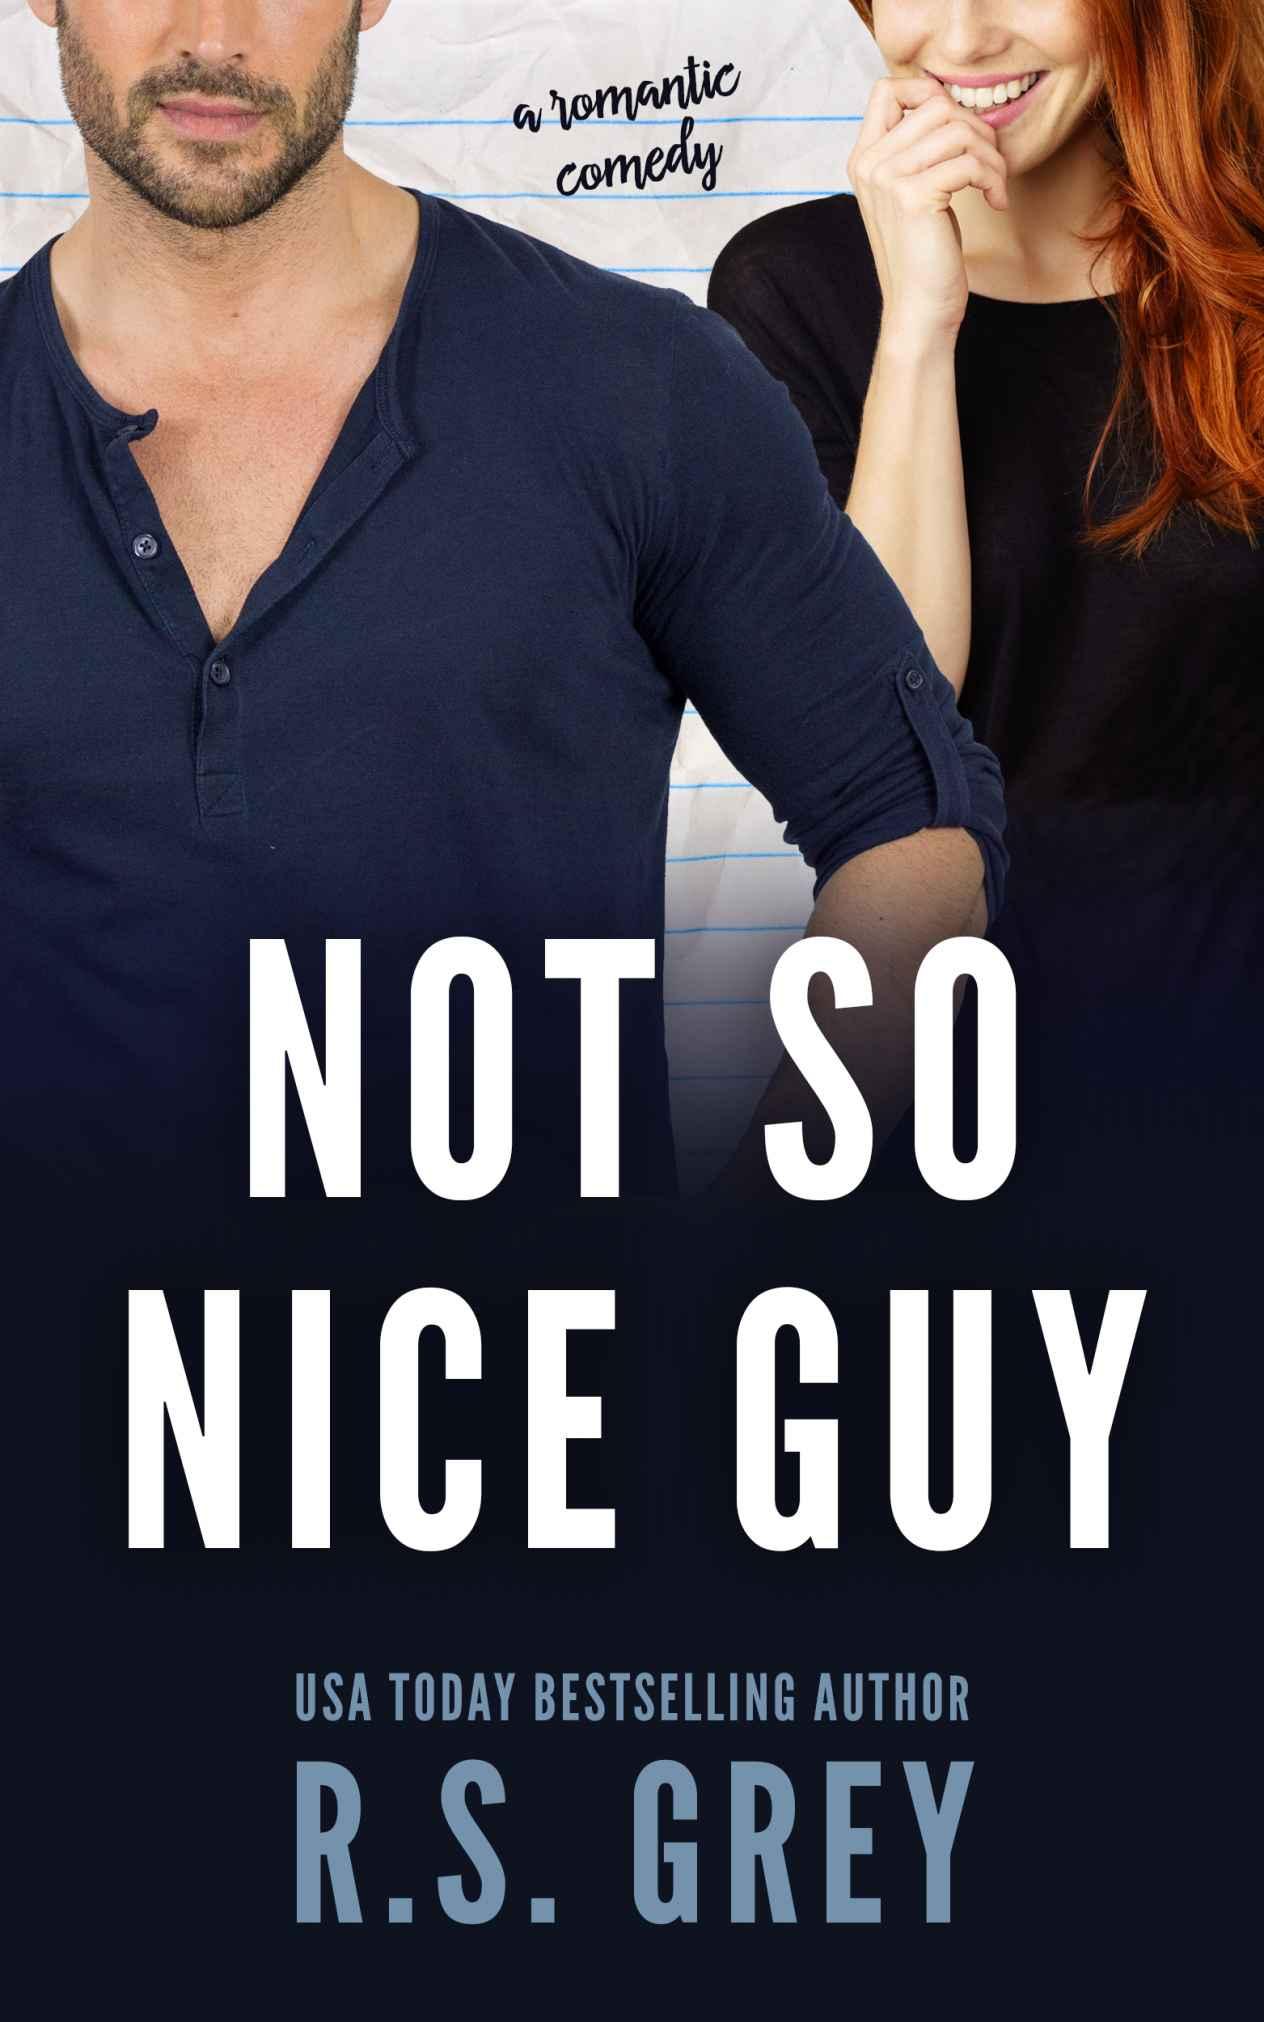 Not So Nice Guy - R.S. Grey [kindle] [mobi]